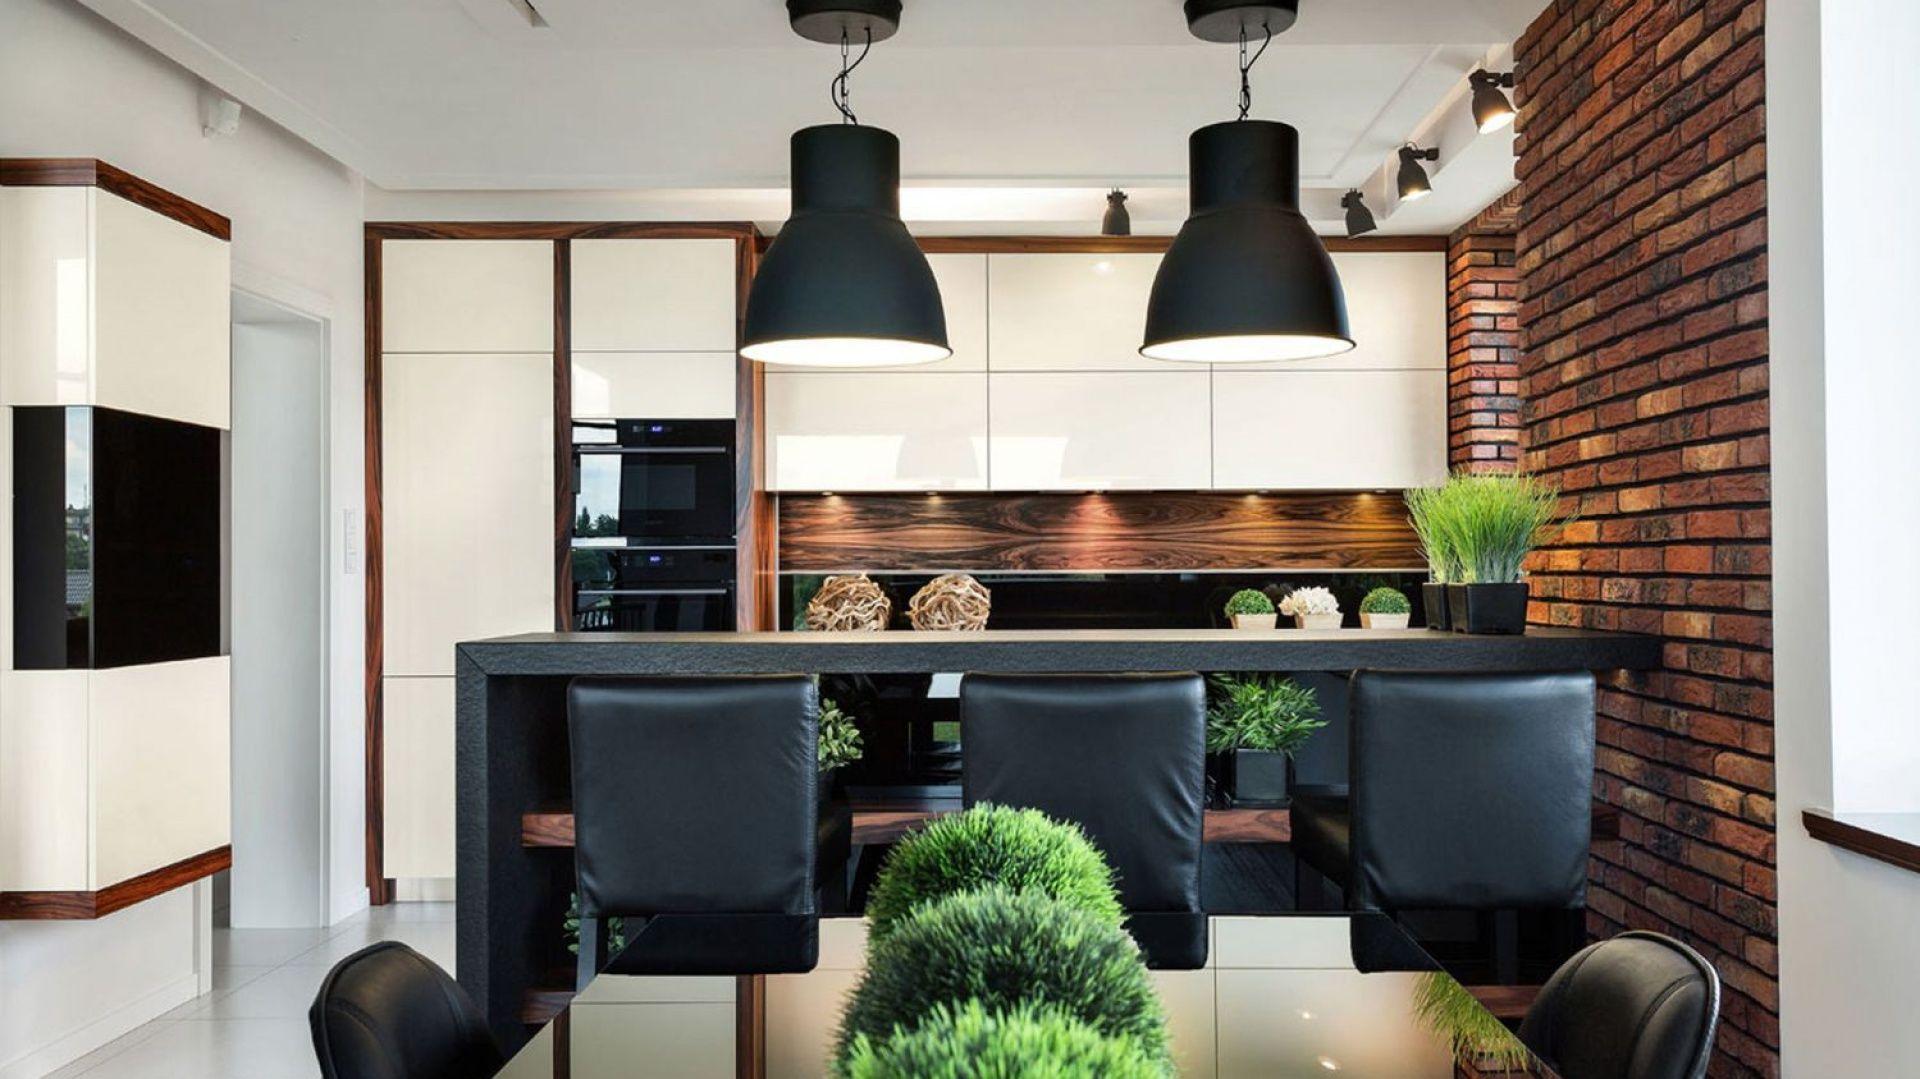 Modna Kuchnia Urzadz Ja W Stylu Loft Home Decor Decor Interior